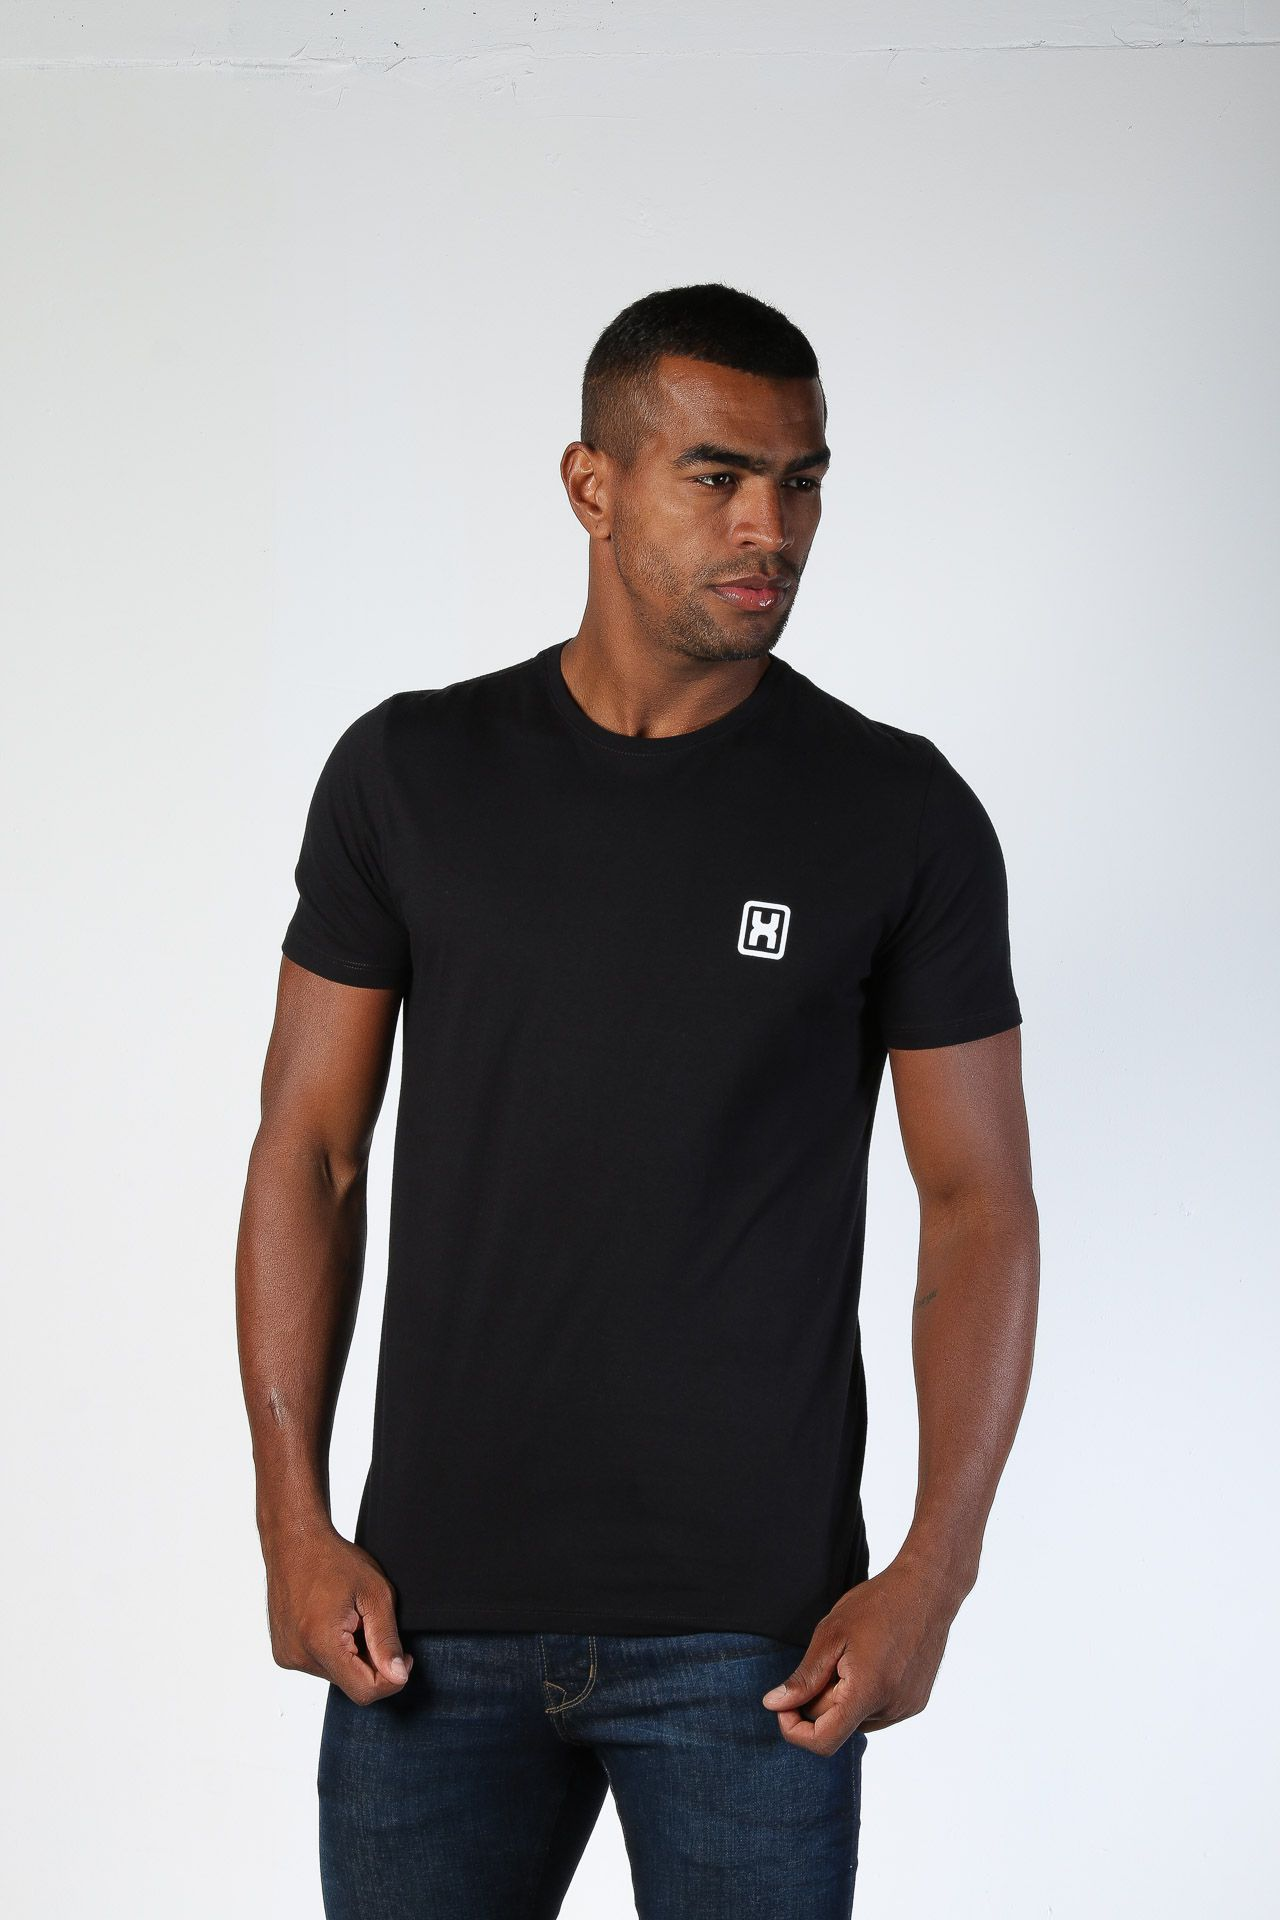 Camiseta Masculina TXC 1588